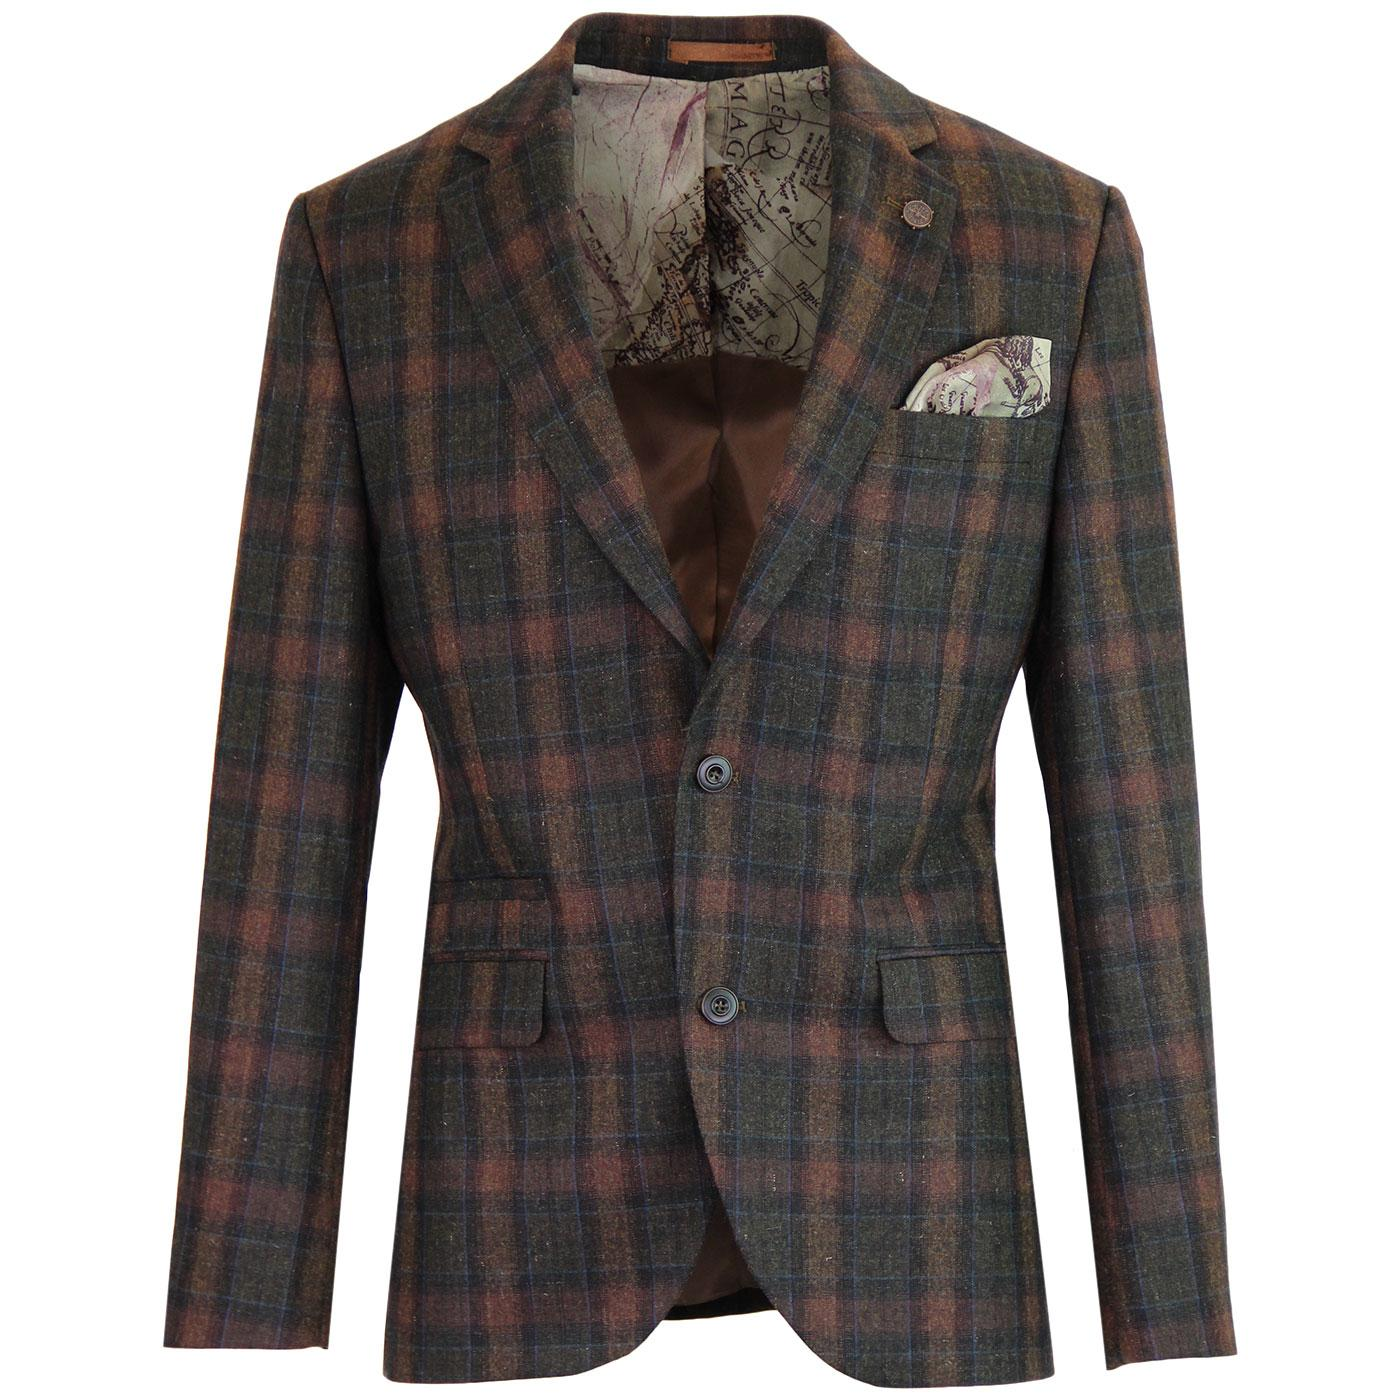 GIBSON LONDON Mod Tartan Check Suit Blazer SAGE